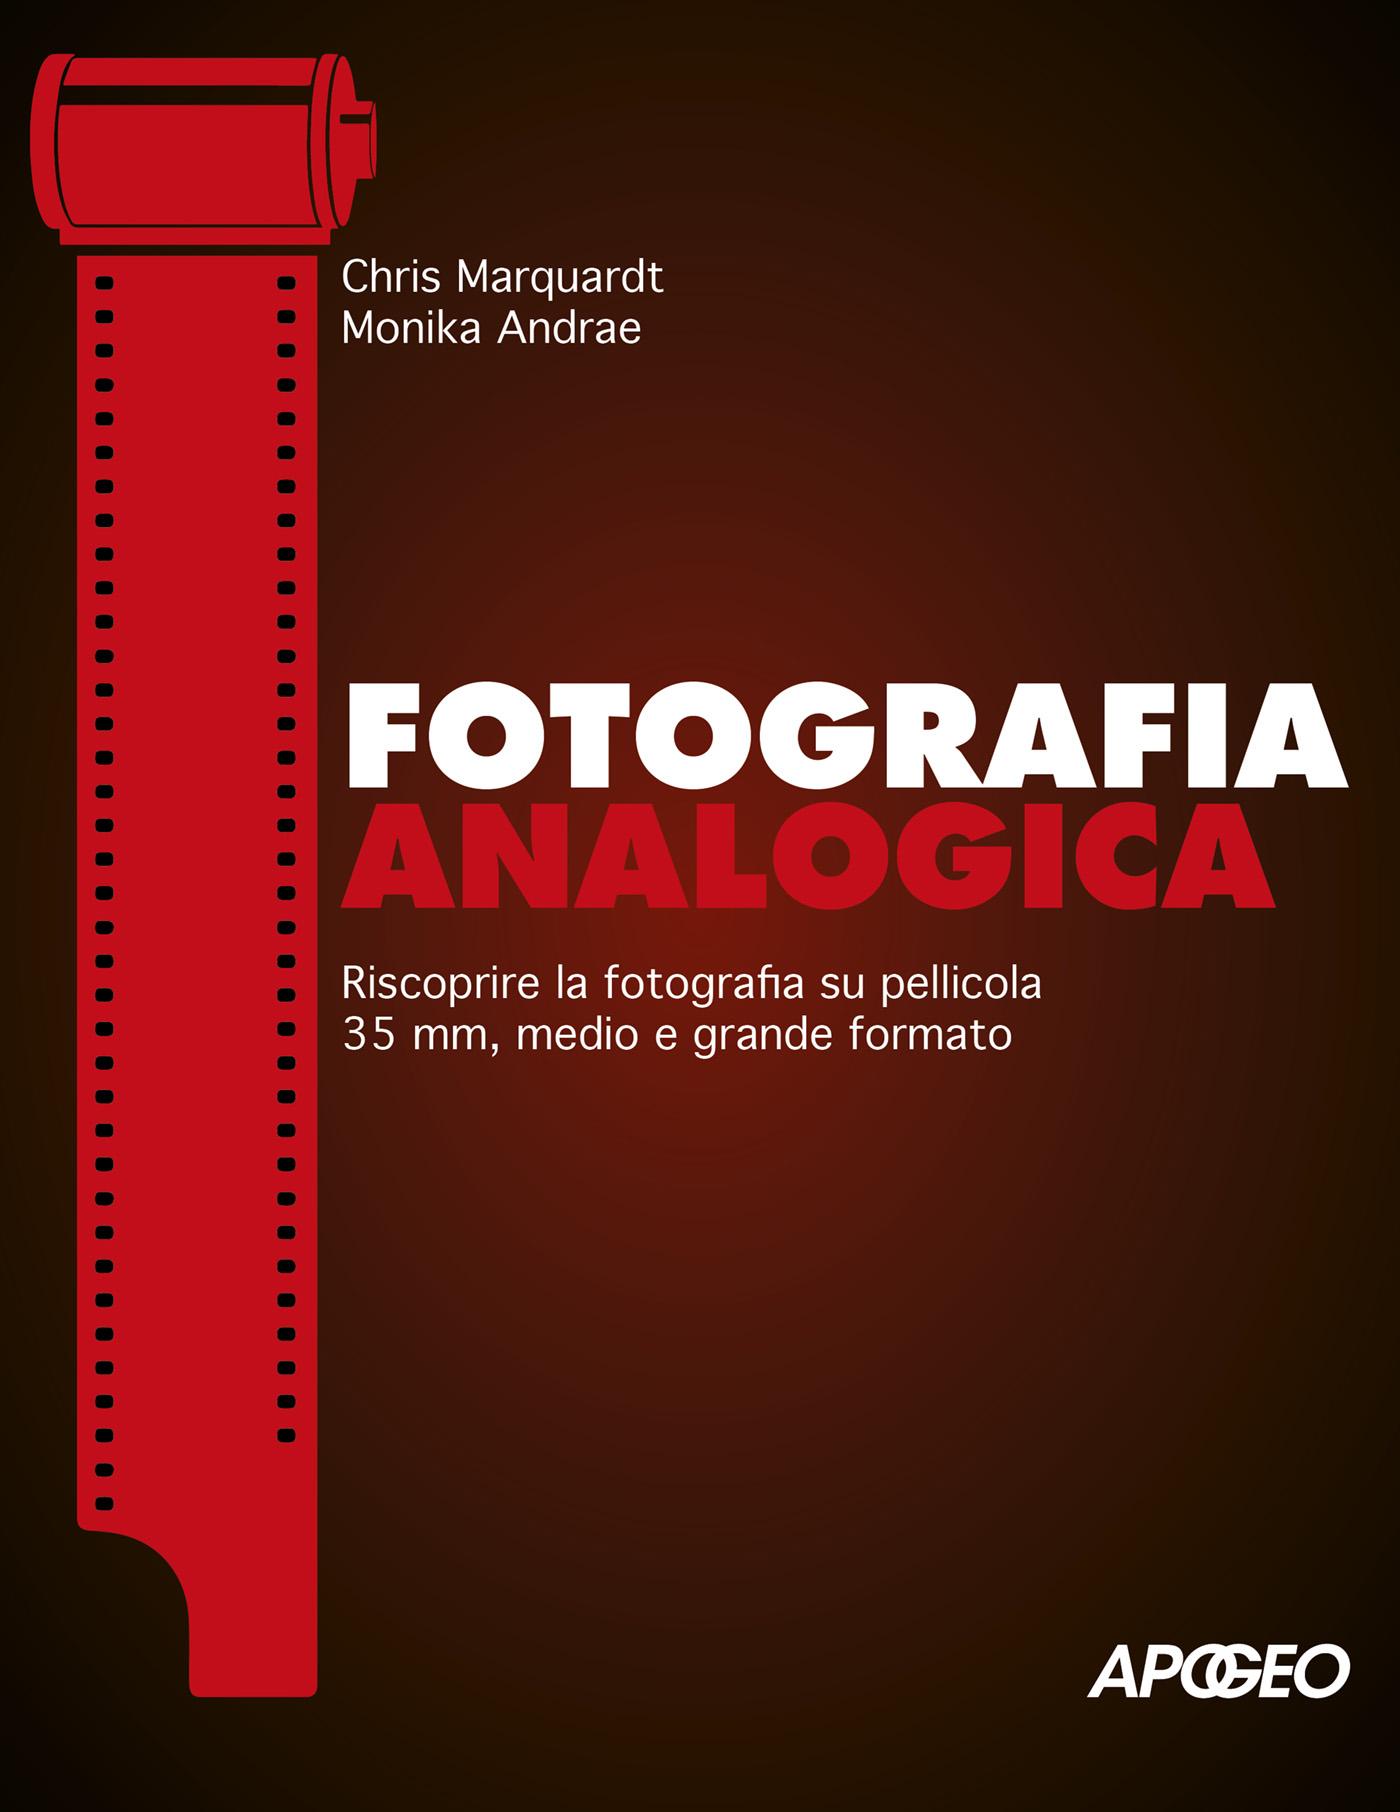 Fotografia analogica, di Chris Marquardt e Monika Andrae